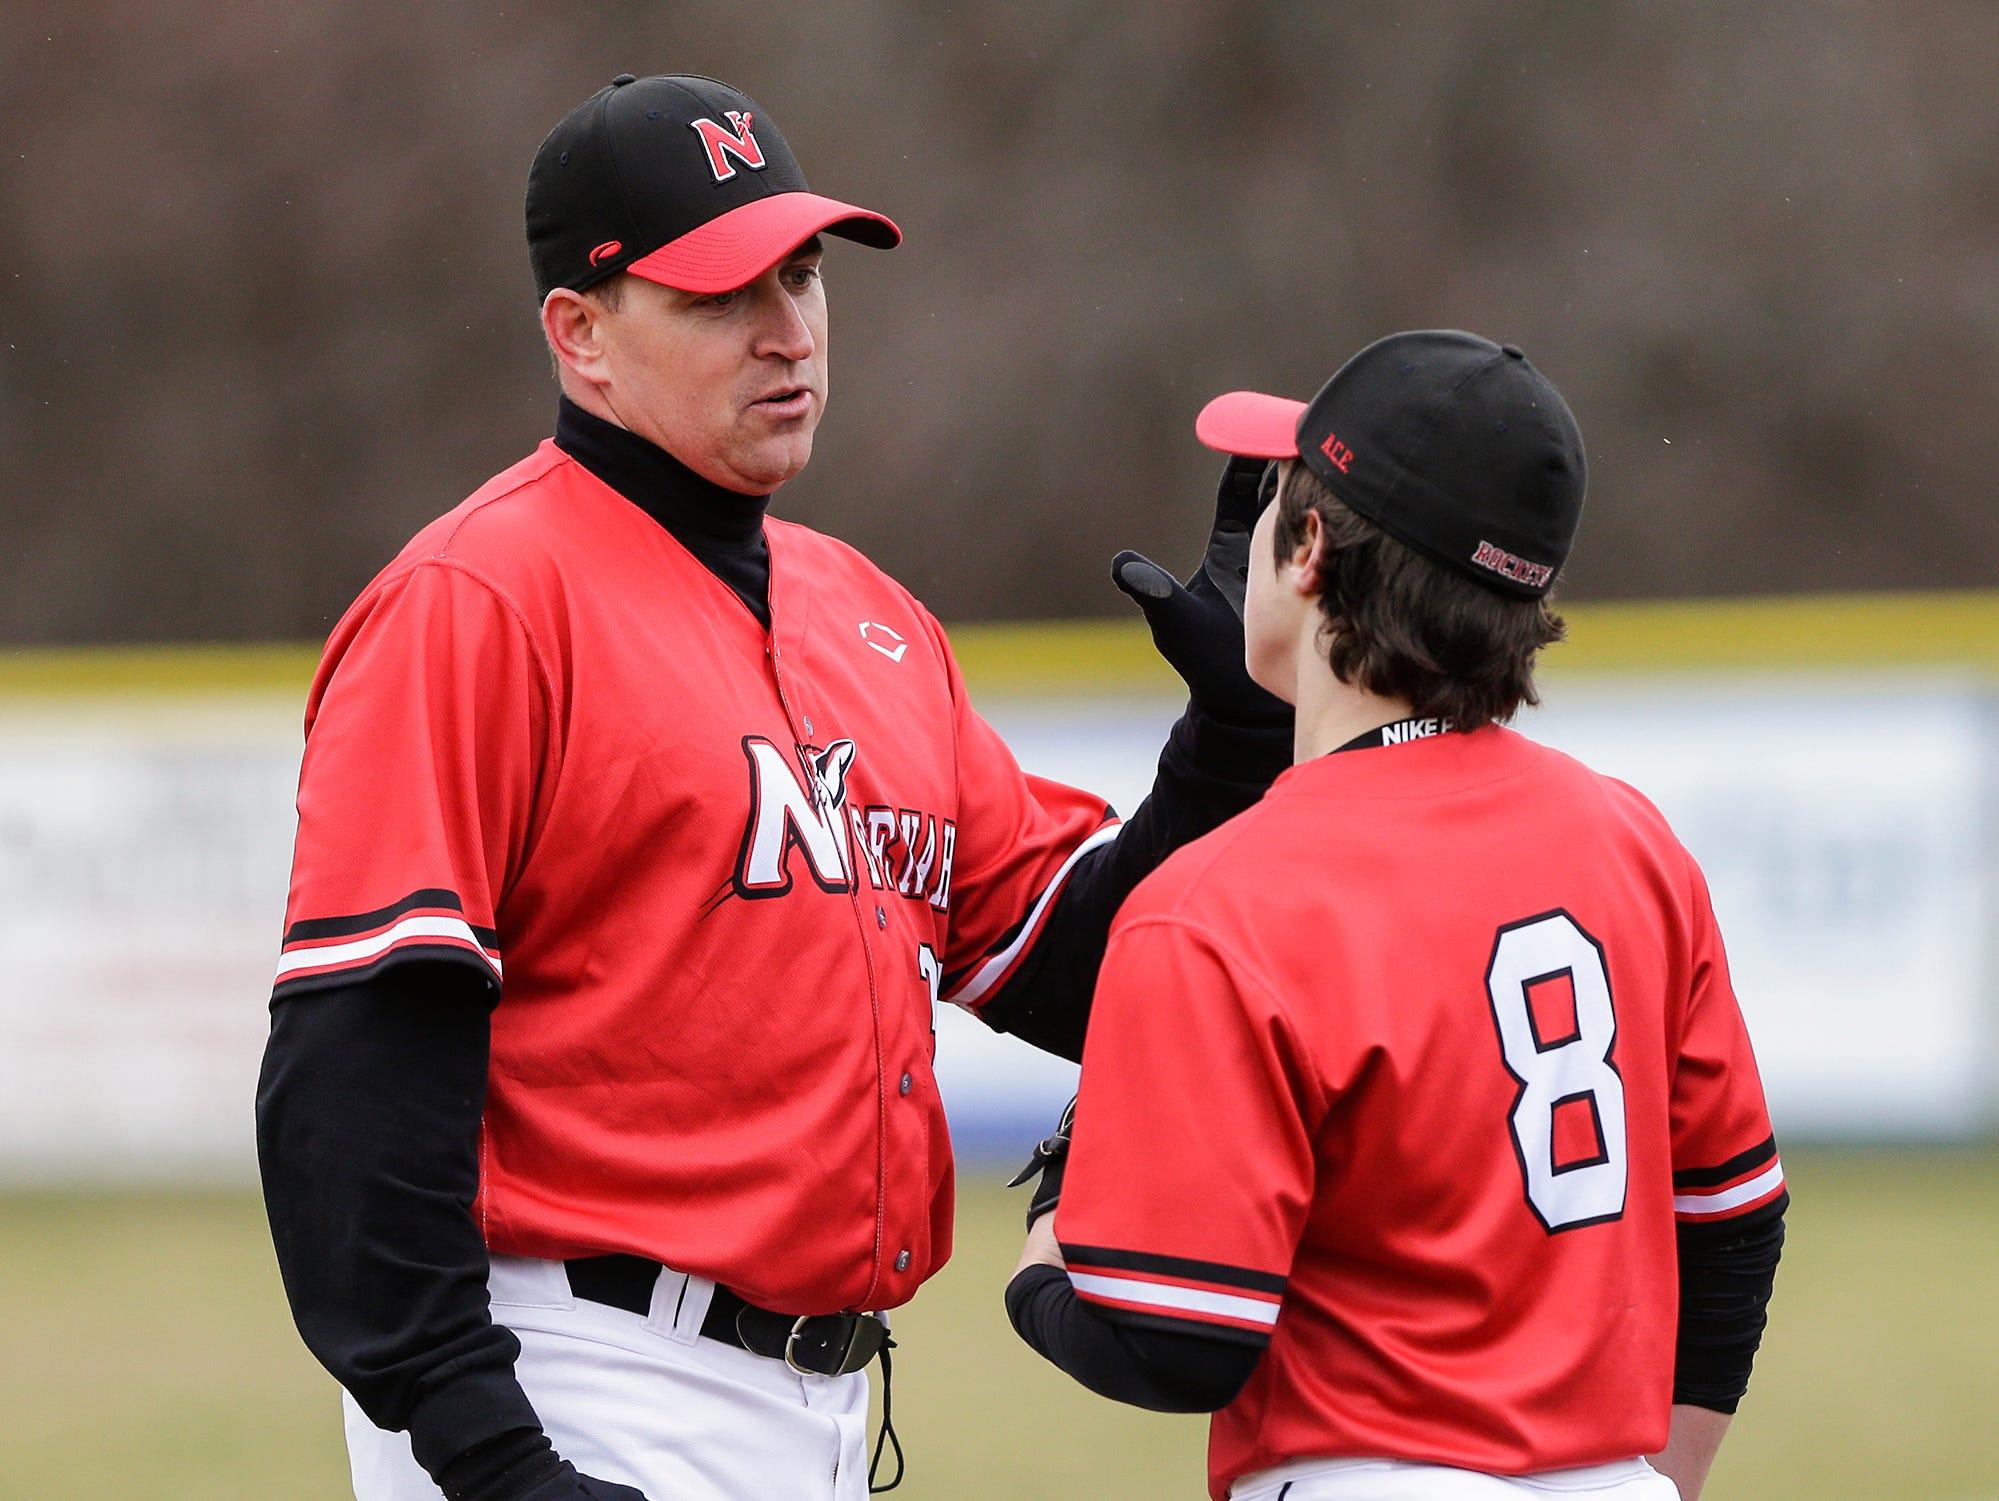 Neenah High School baseball's head coach Jack Taschner talks to Jaden Hackbarth during their game against Fond du Lac High School Thursday, April 18, 2019 in Fond du Lac, Wis. Doug Raflik/USA TODAY NETWORK-Wisconsin